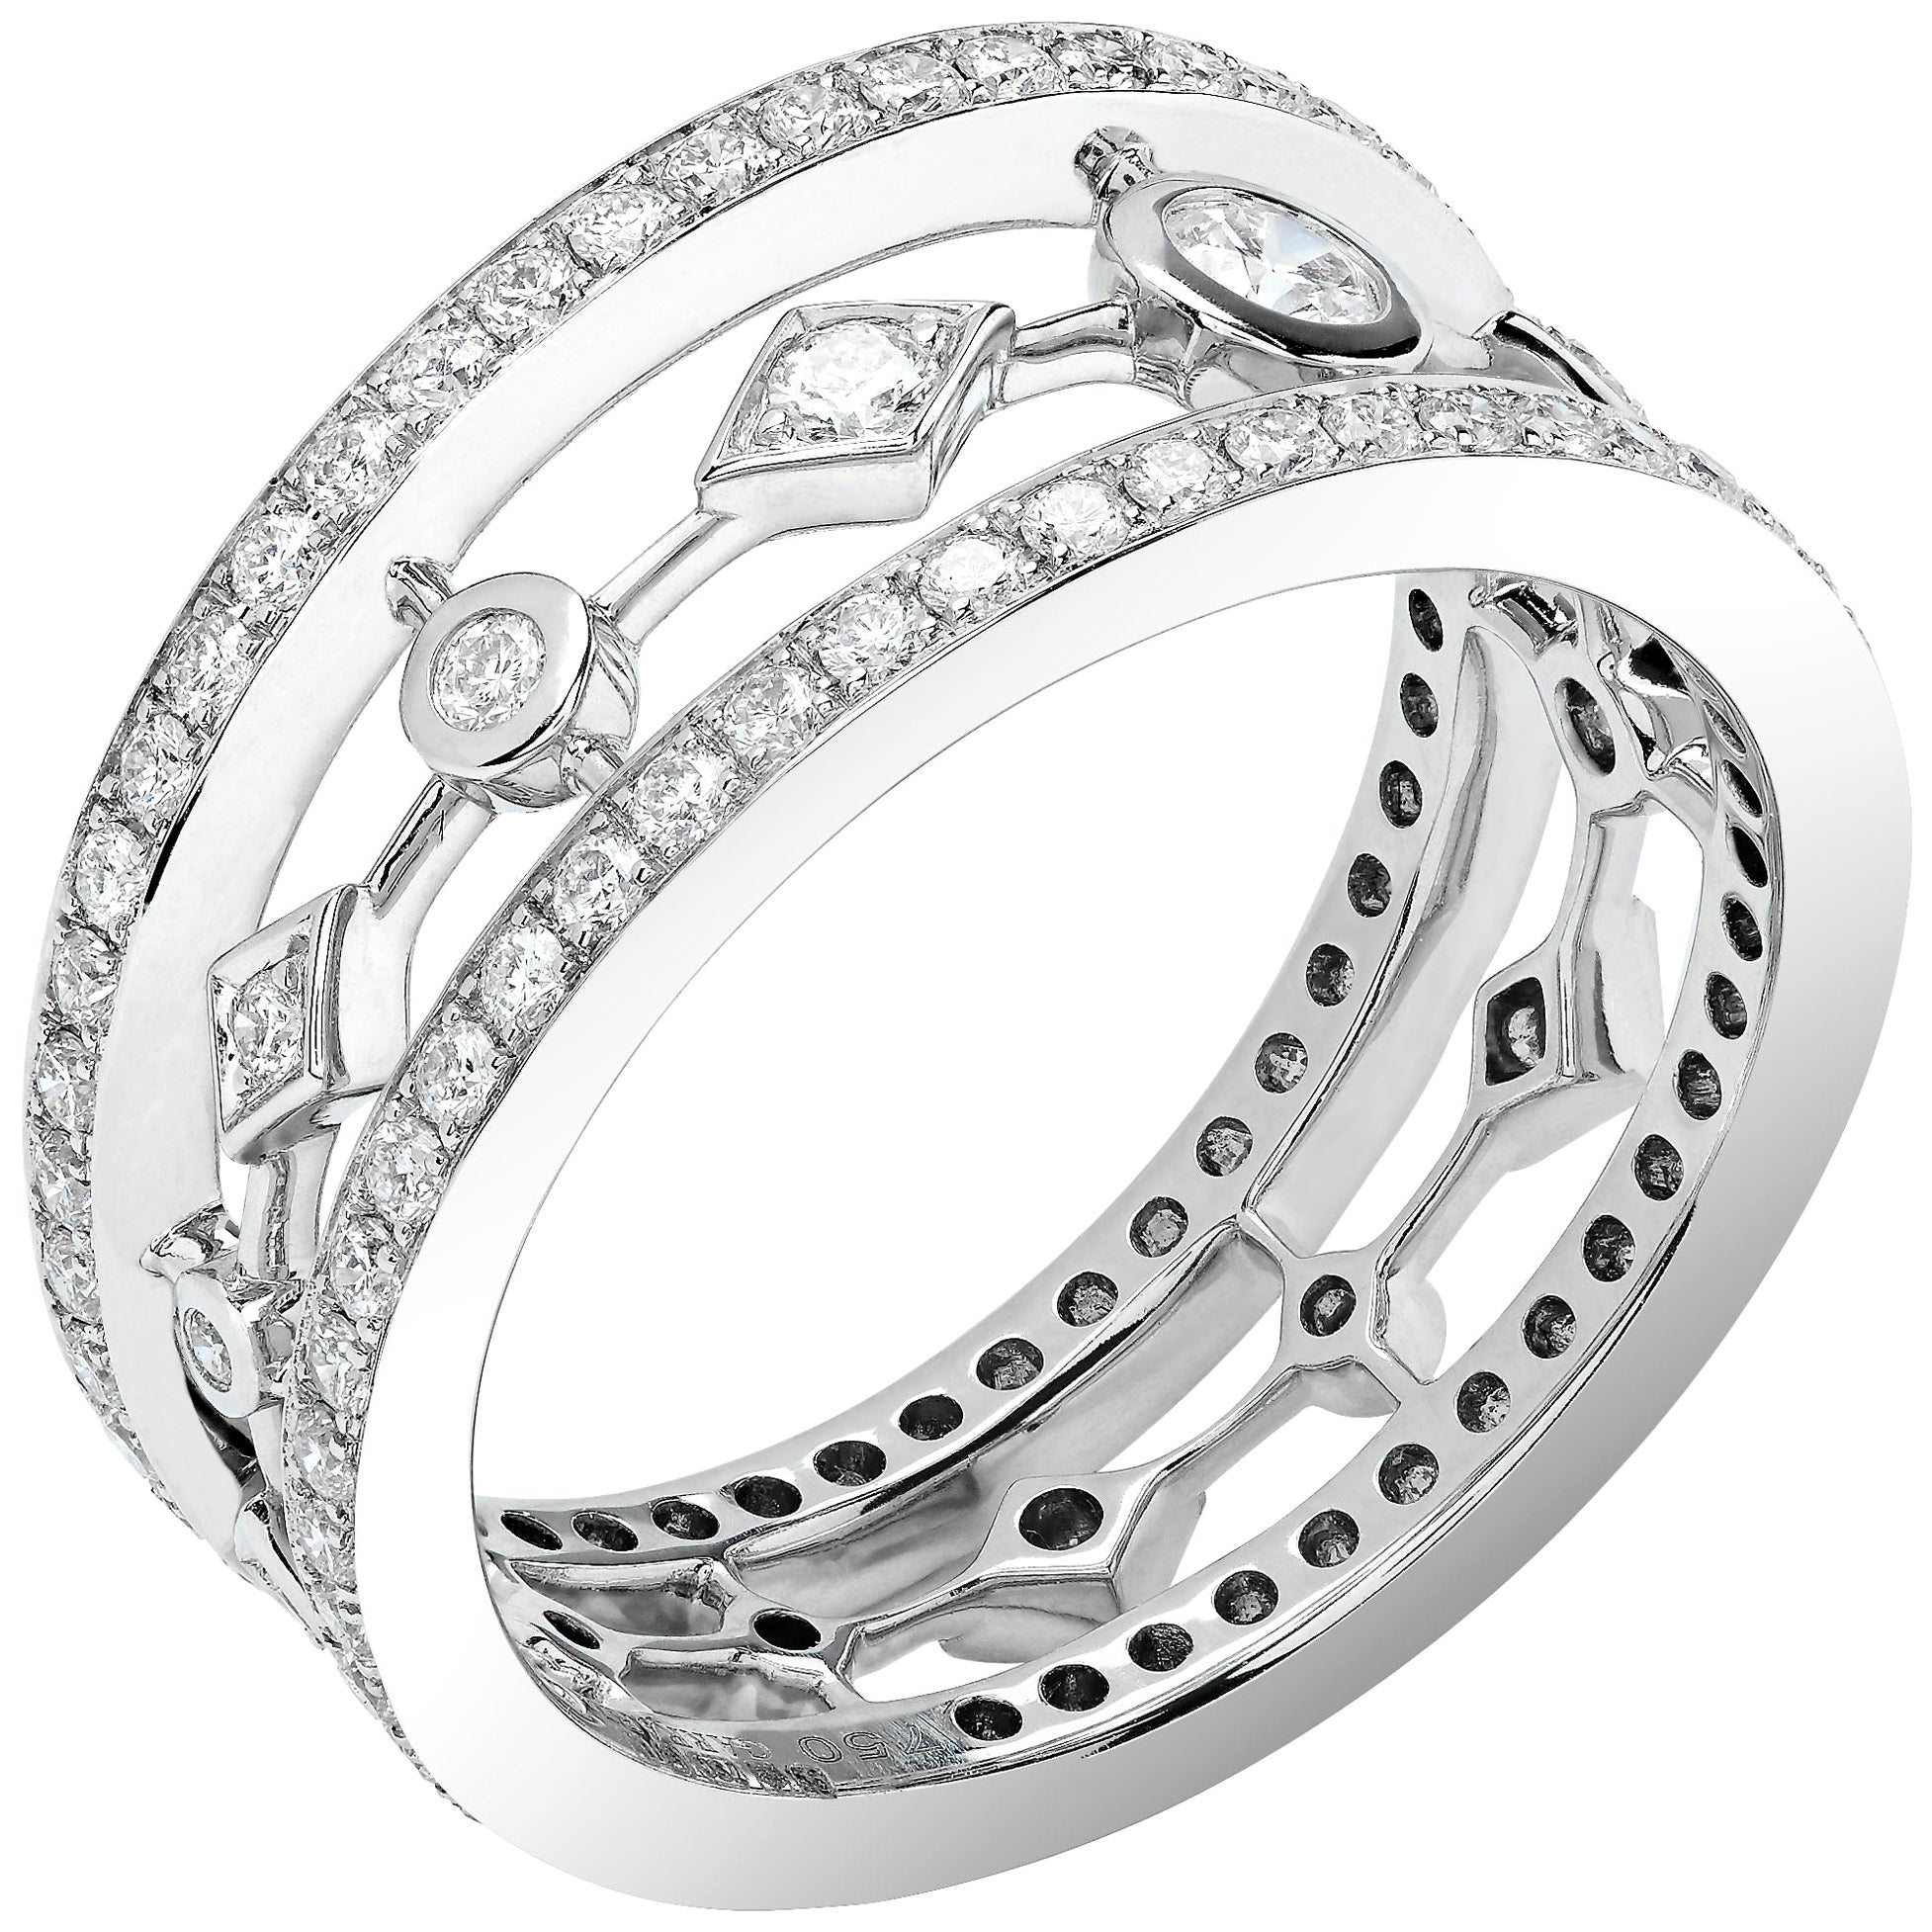 Garrard 'Fanfare' 18 Karat White and Gold White Diamond Ring